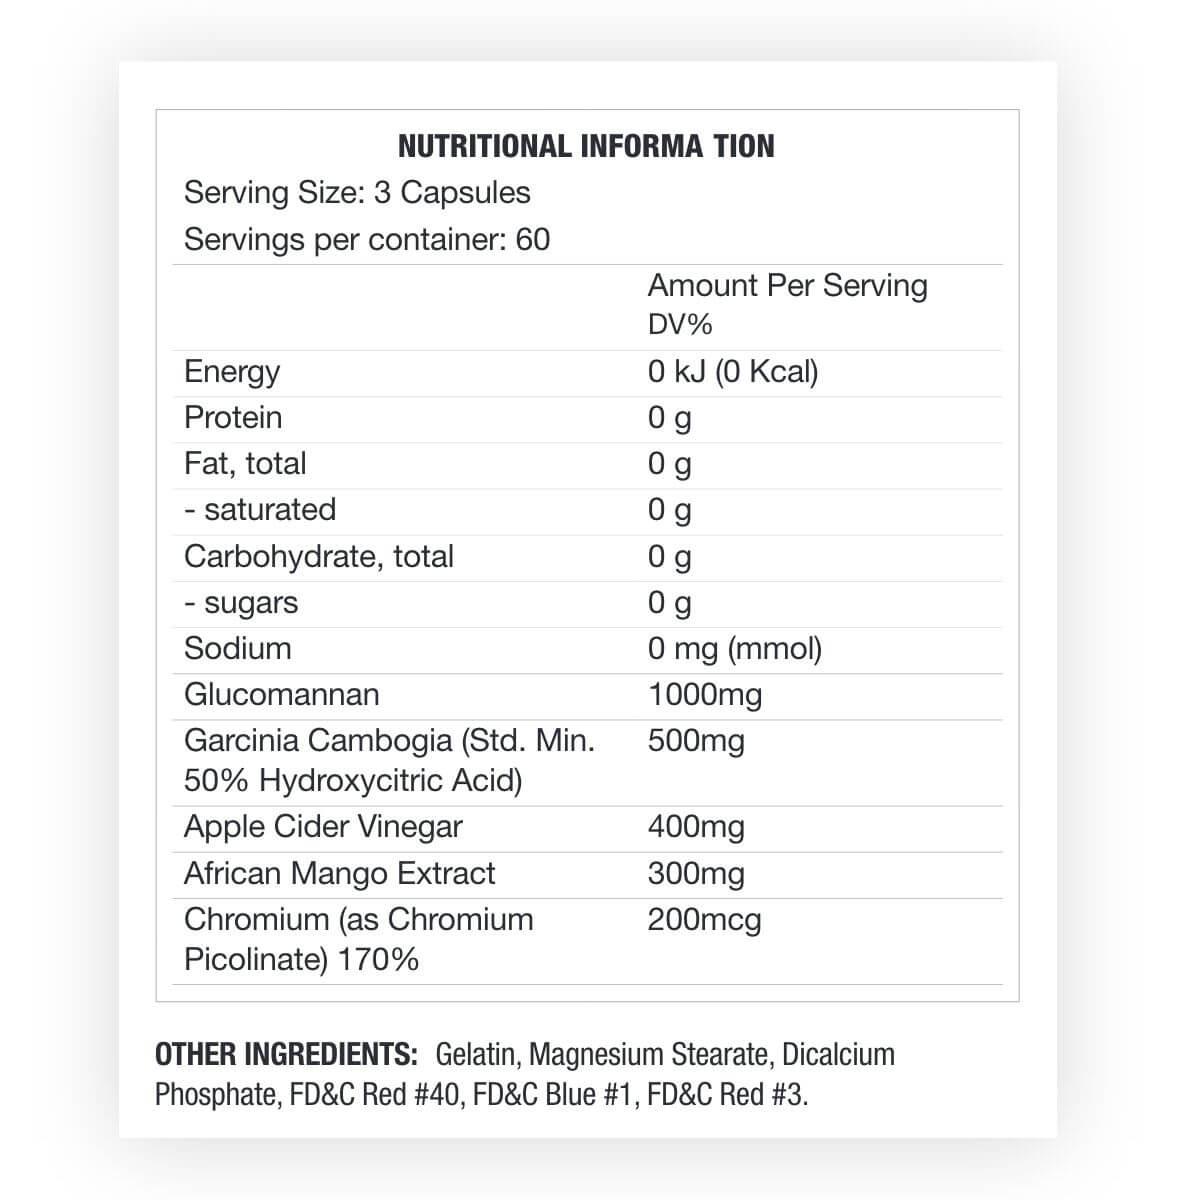 Glucomannan and chromium weight loss reviews